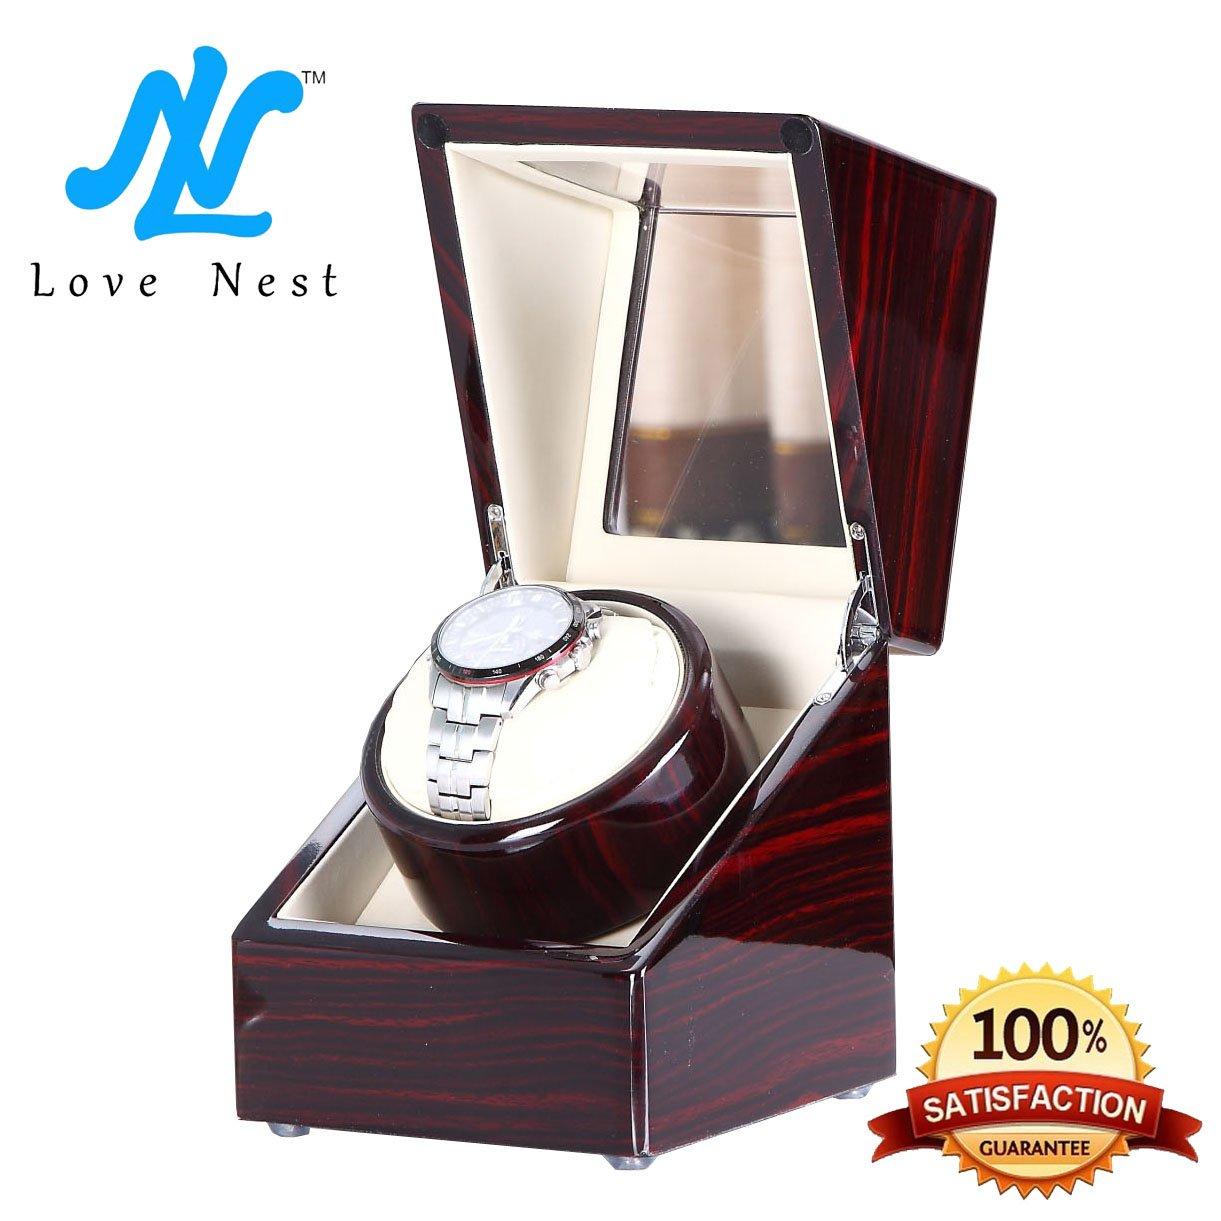 Love Nest Single Watch Winder Piano Finish Pure Handmade with Japanese Mabuchi Motor(Power Included)